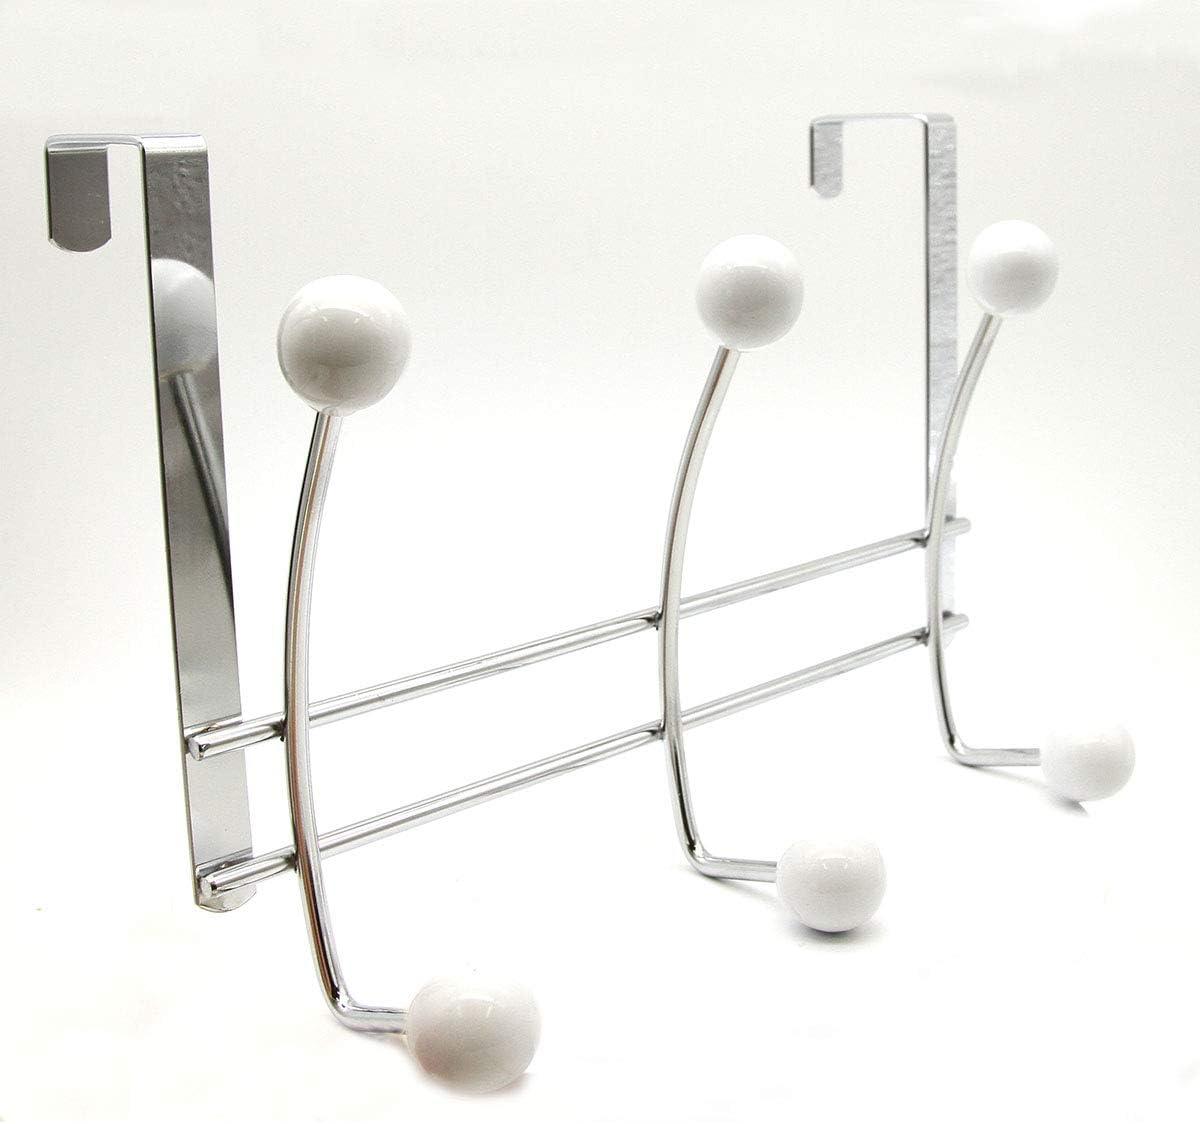 EVIDECO 9604100 Door 6 Metal Rack Industry No. 1 White Chrome Hooks 1 year warranty